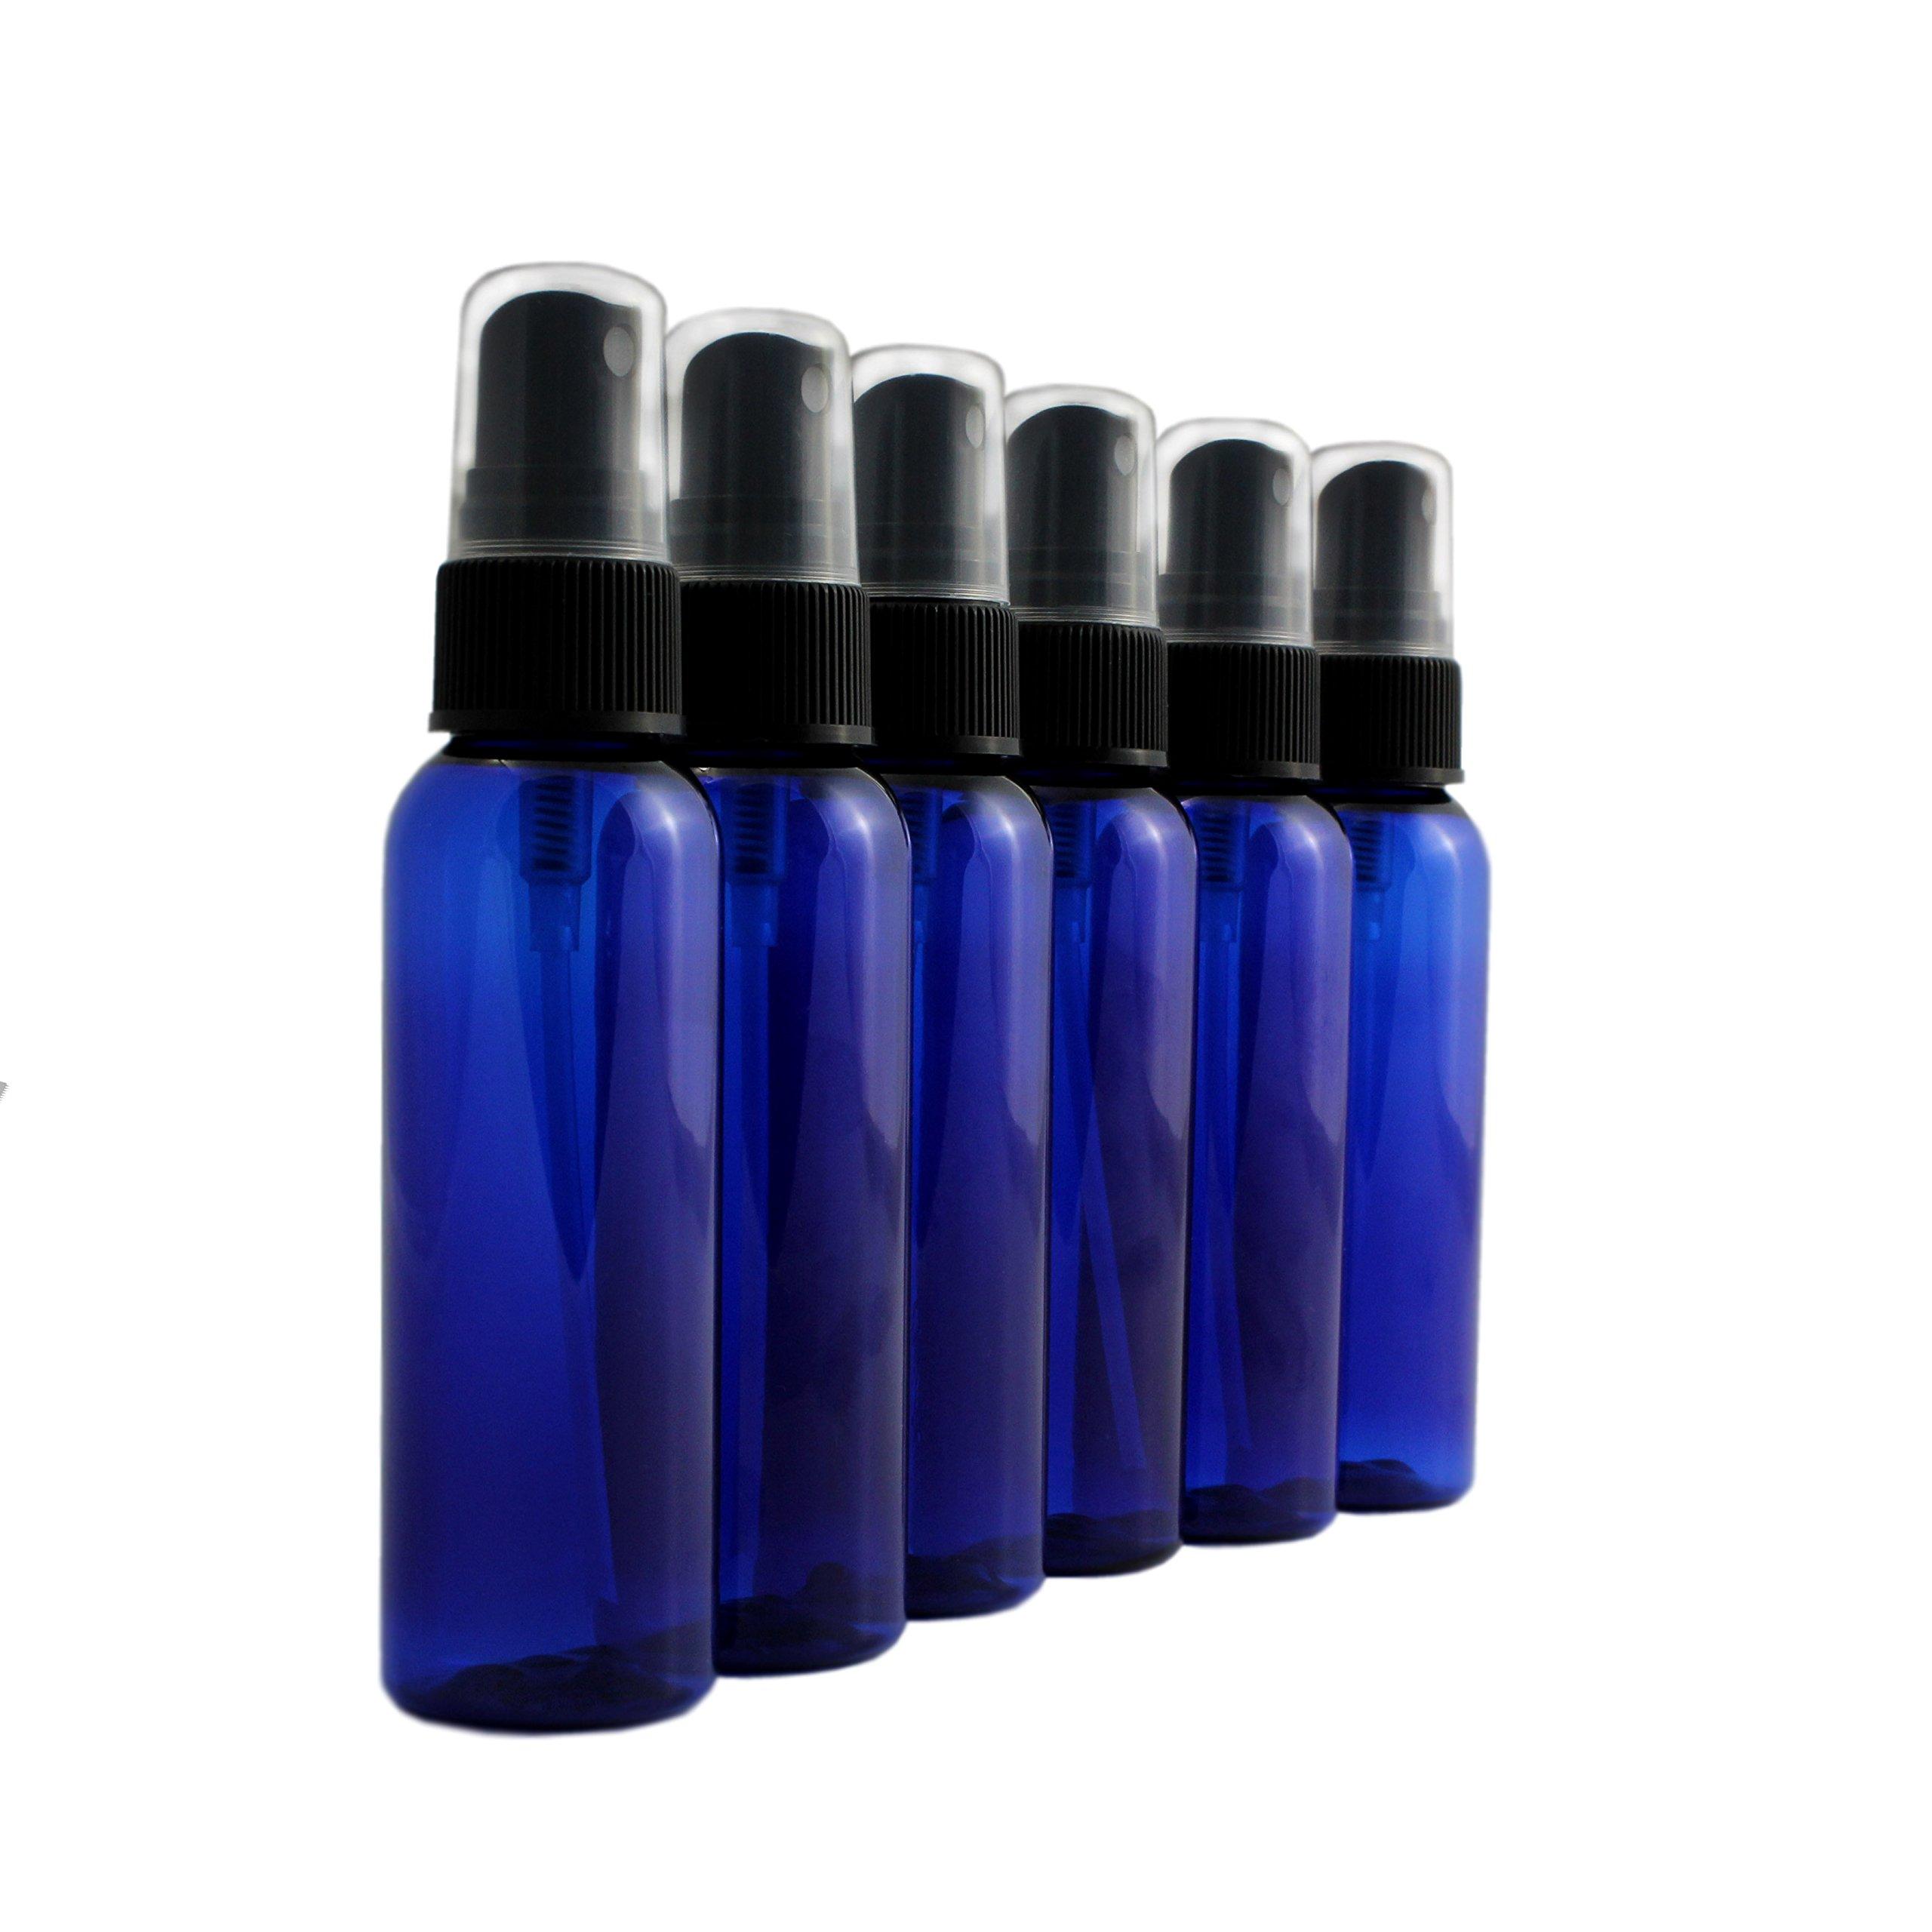 5a7e16686348 Buy 6 x 2oz New & Empty DIY Cobalt Blue Glass Jars with White Metal ...